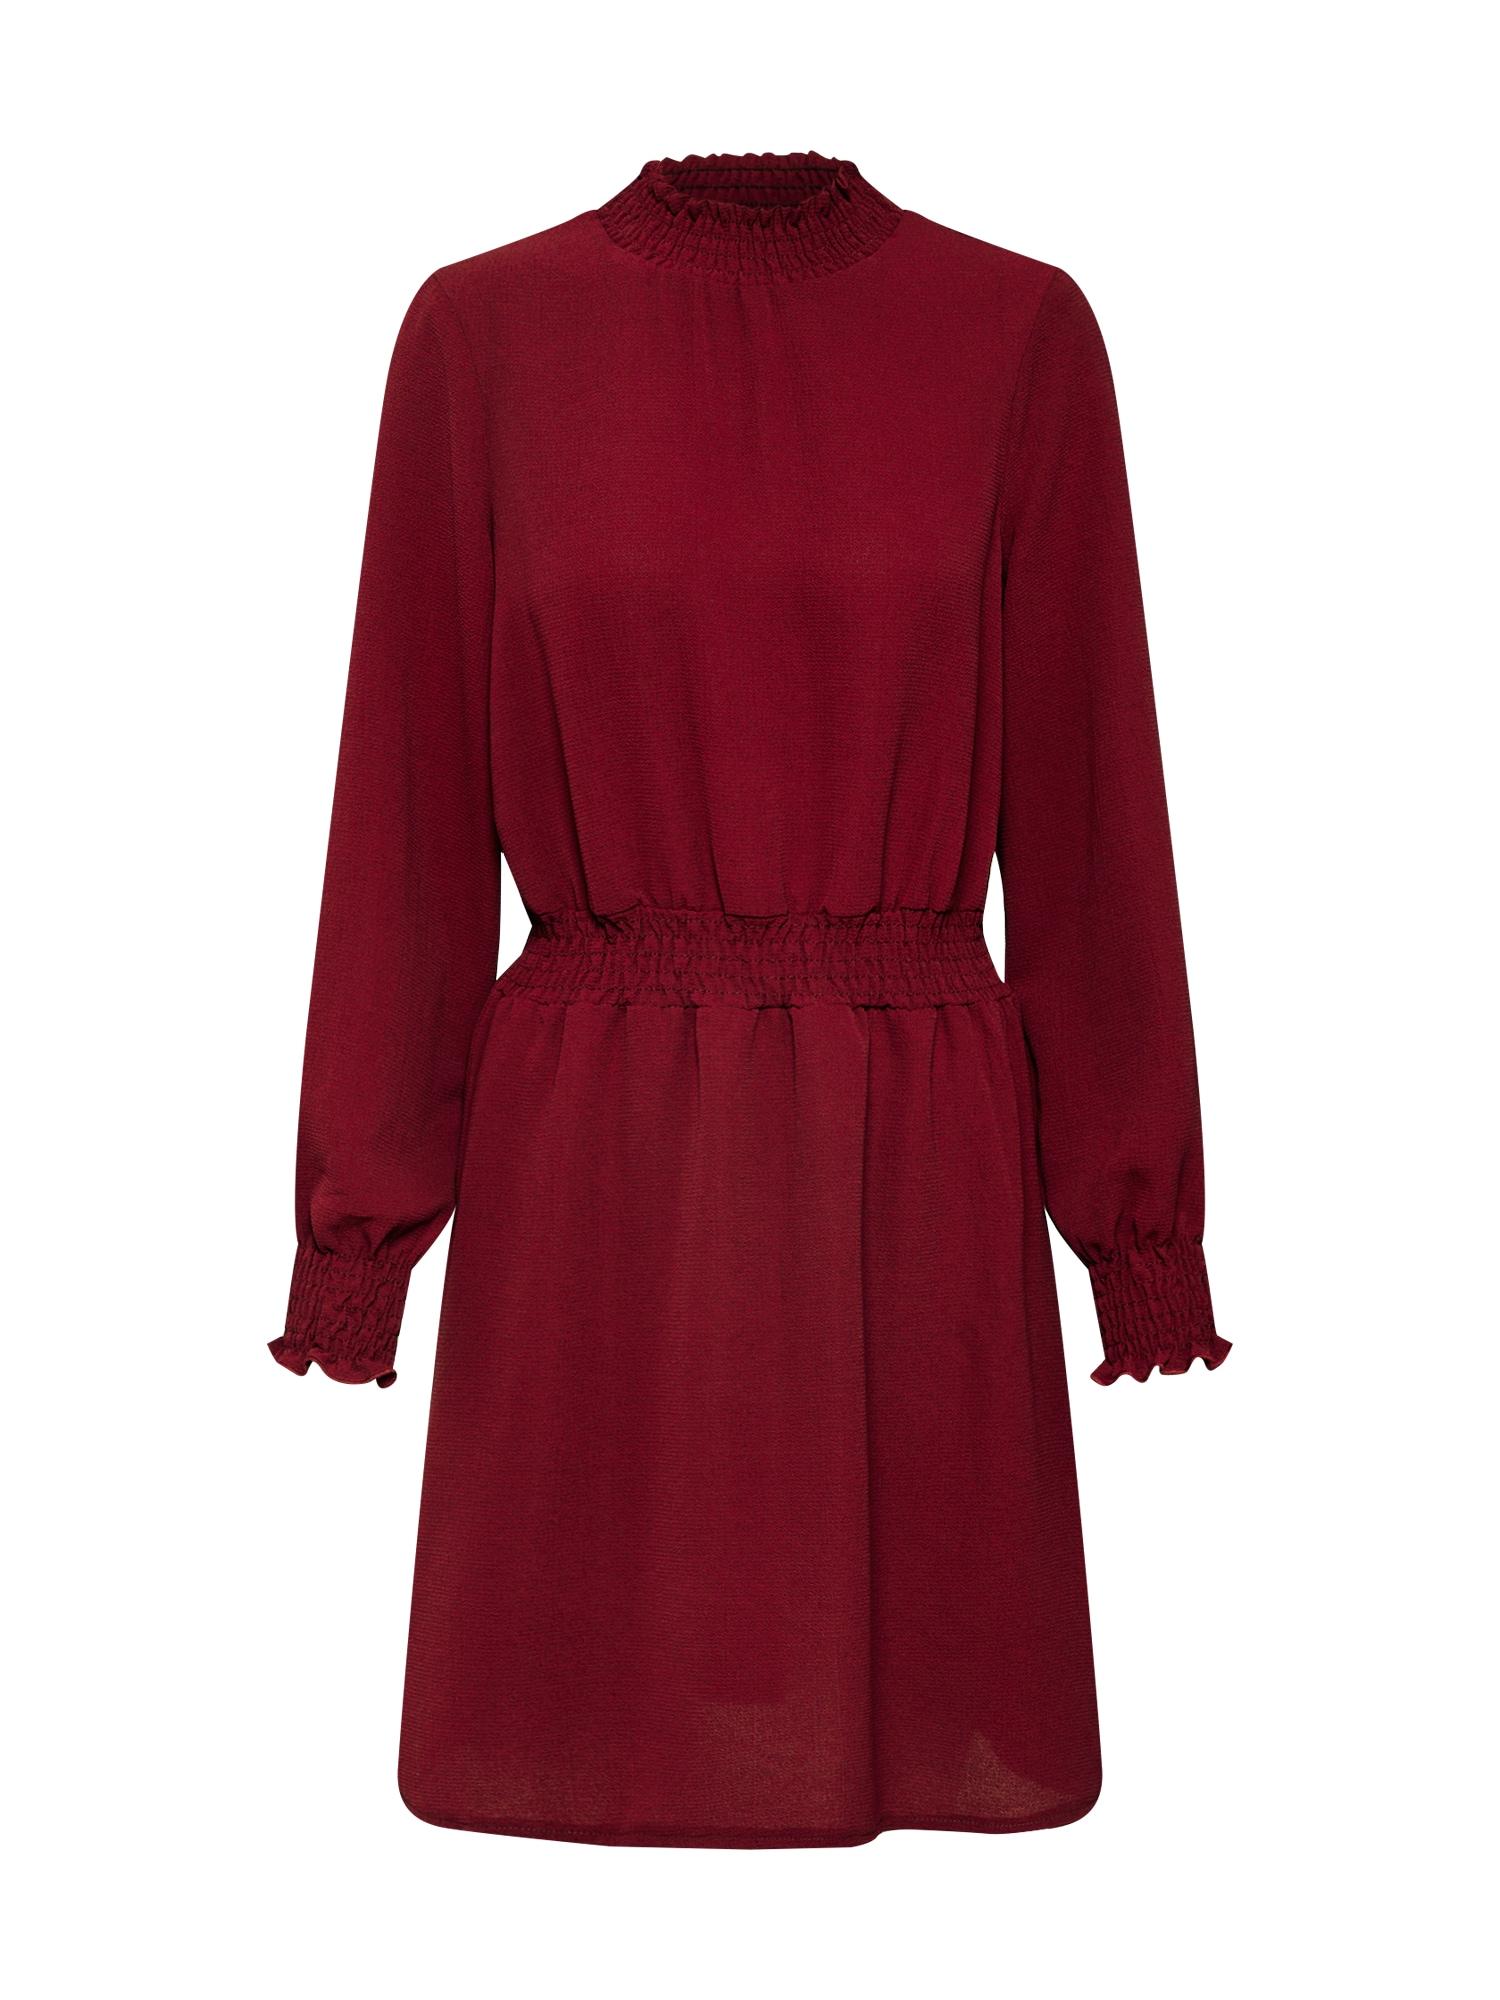 NEW LOOK Koktejlové šaty  burgundská červeň